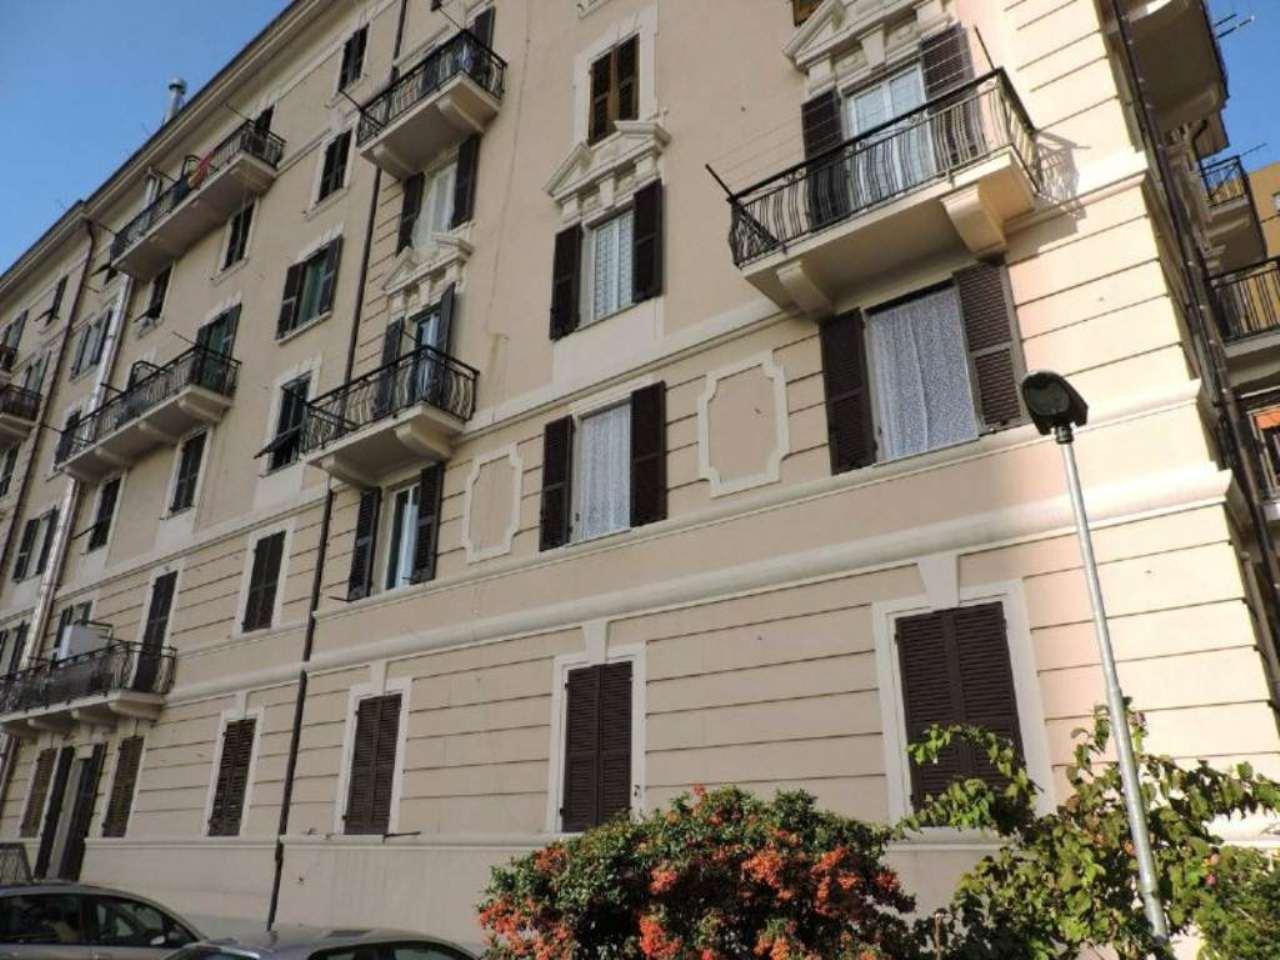 Bilocale Genova Via Dino Col 1